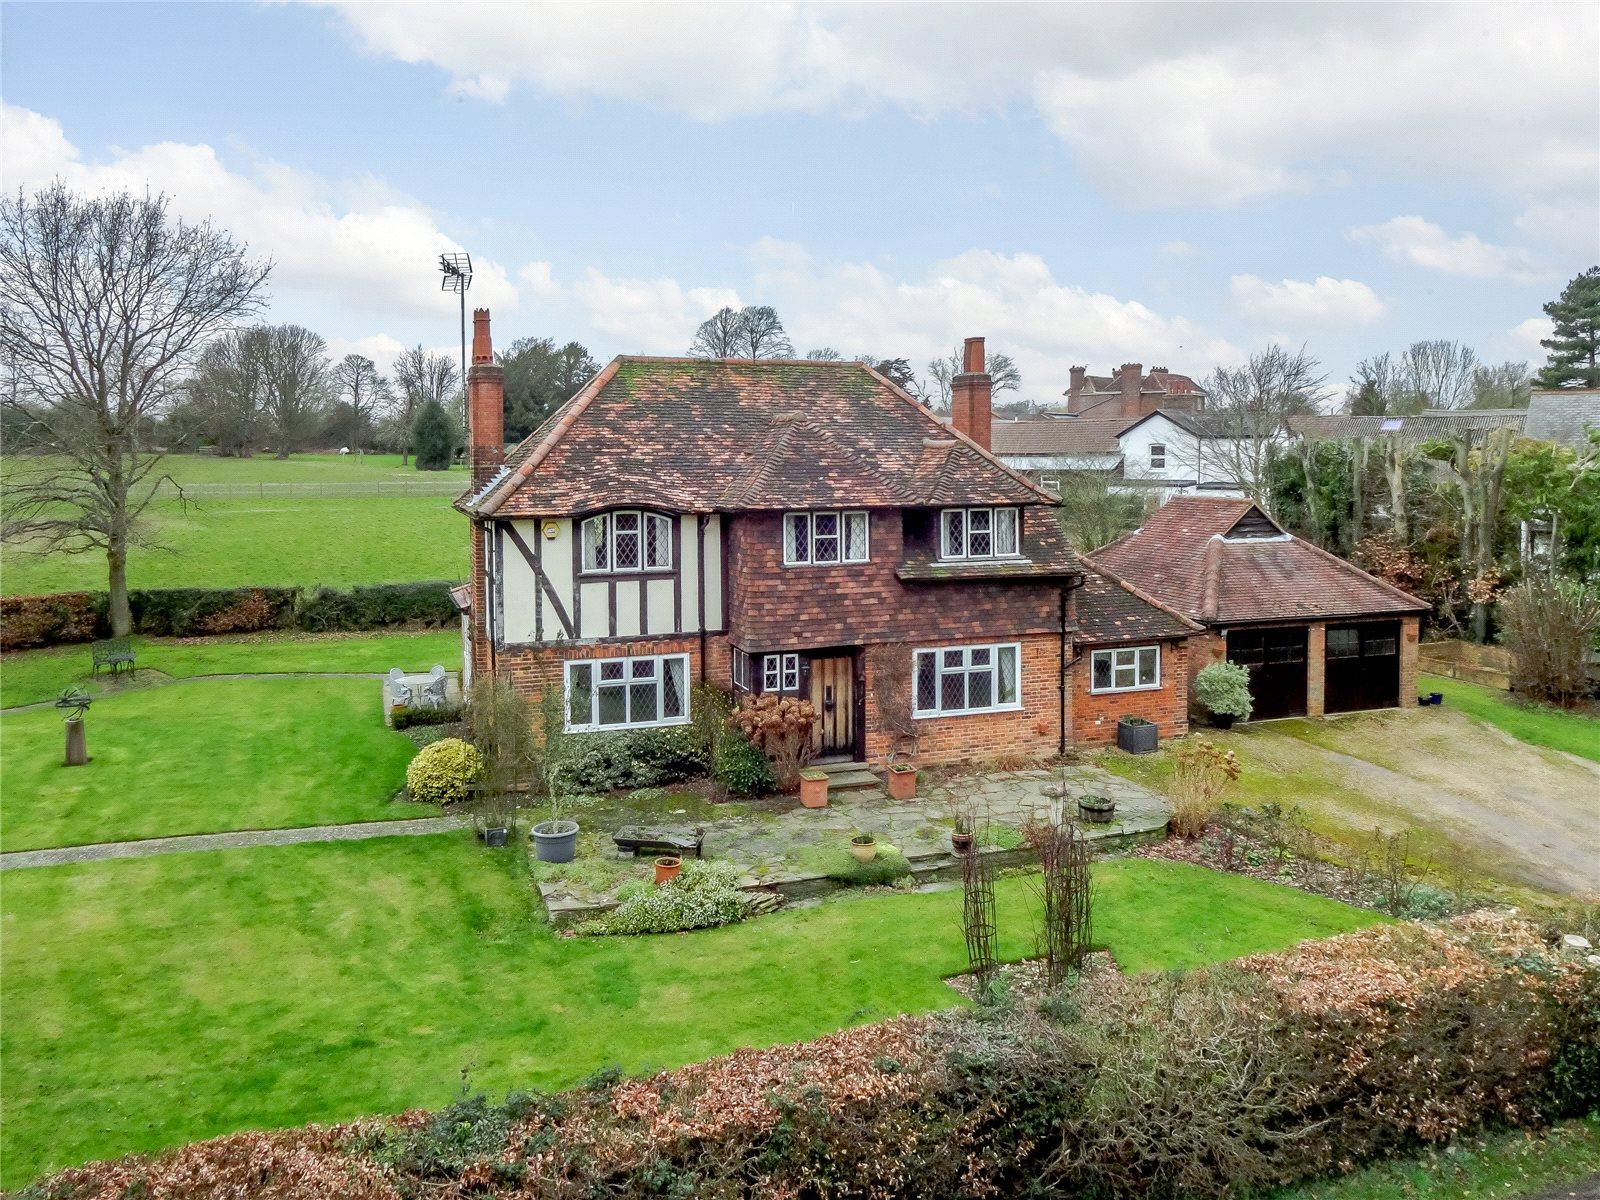 Single Family Home for Sale at Hammonds End Lane, Harpenden, Hertfordshire, AL5 Harpenden, England